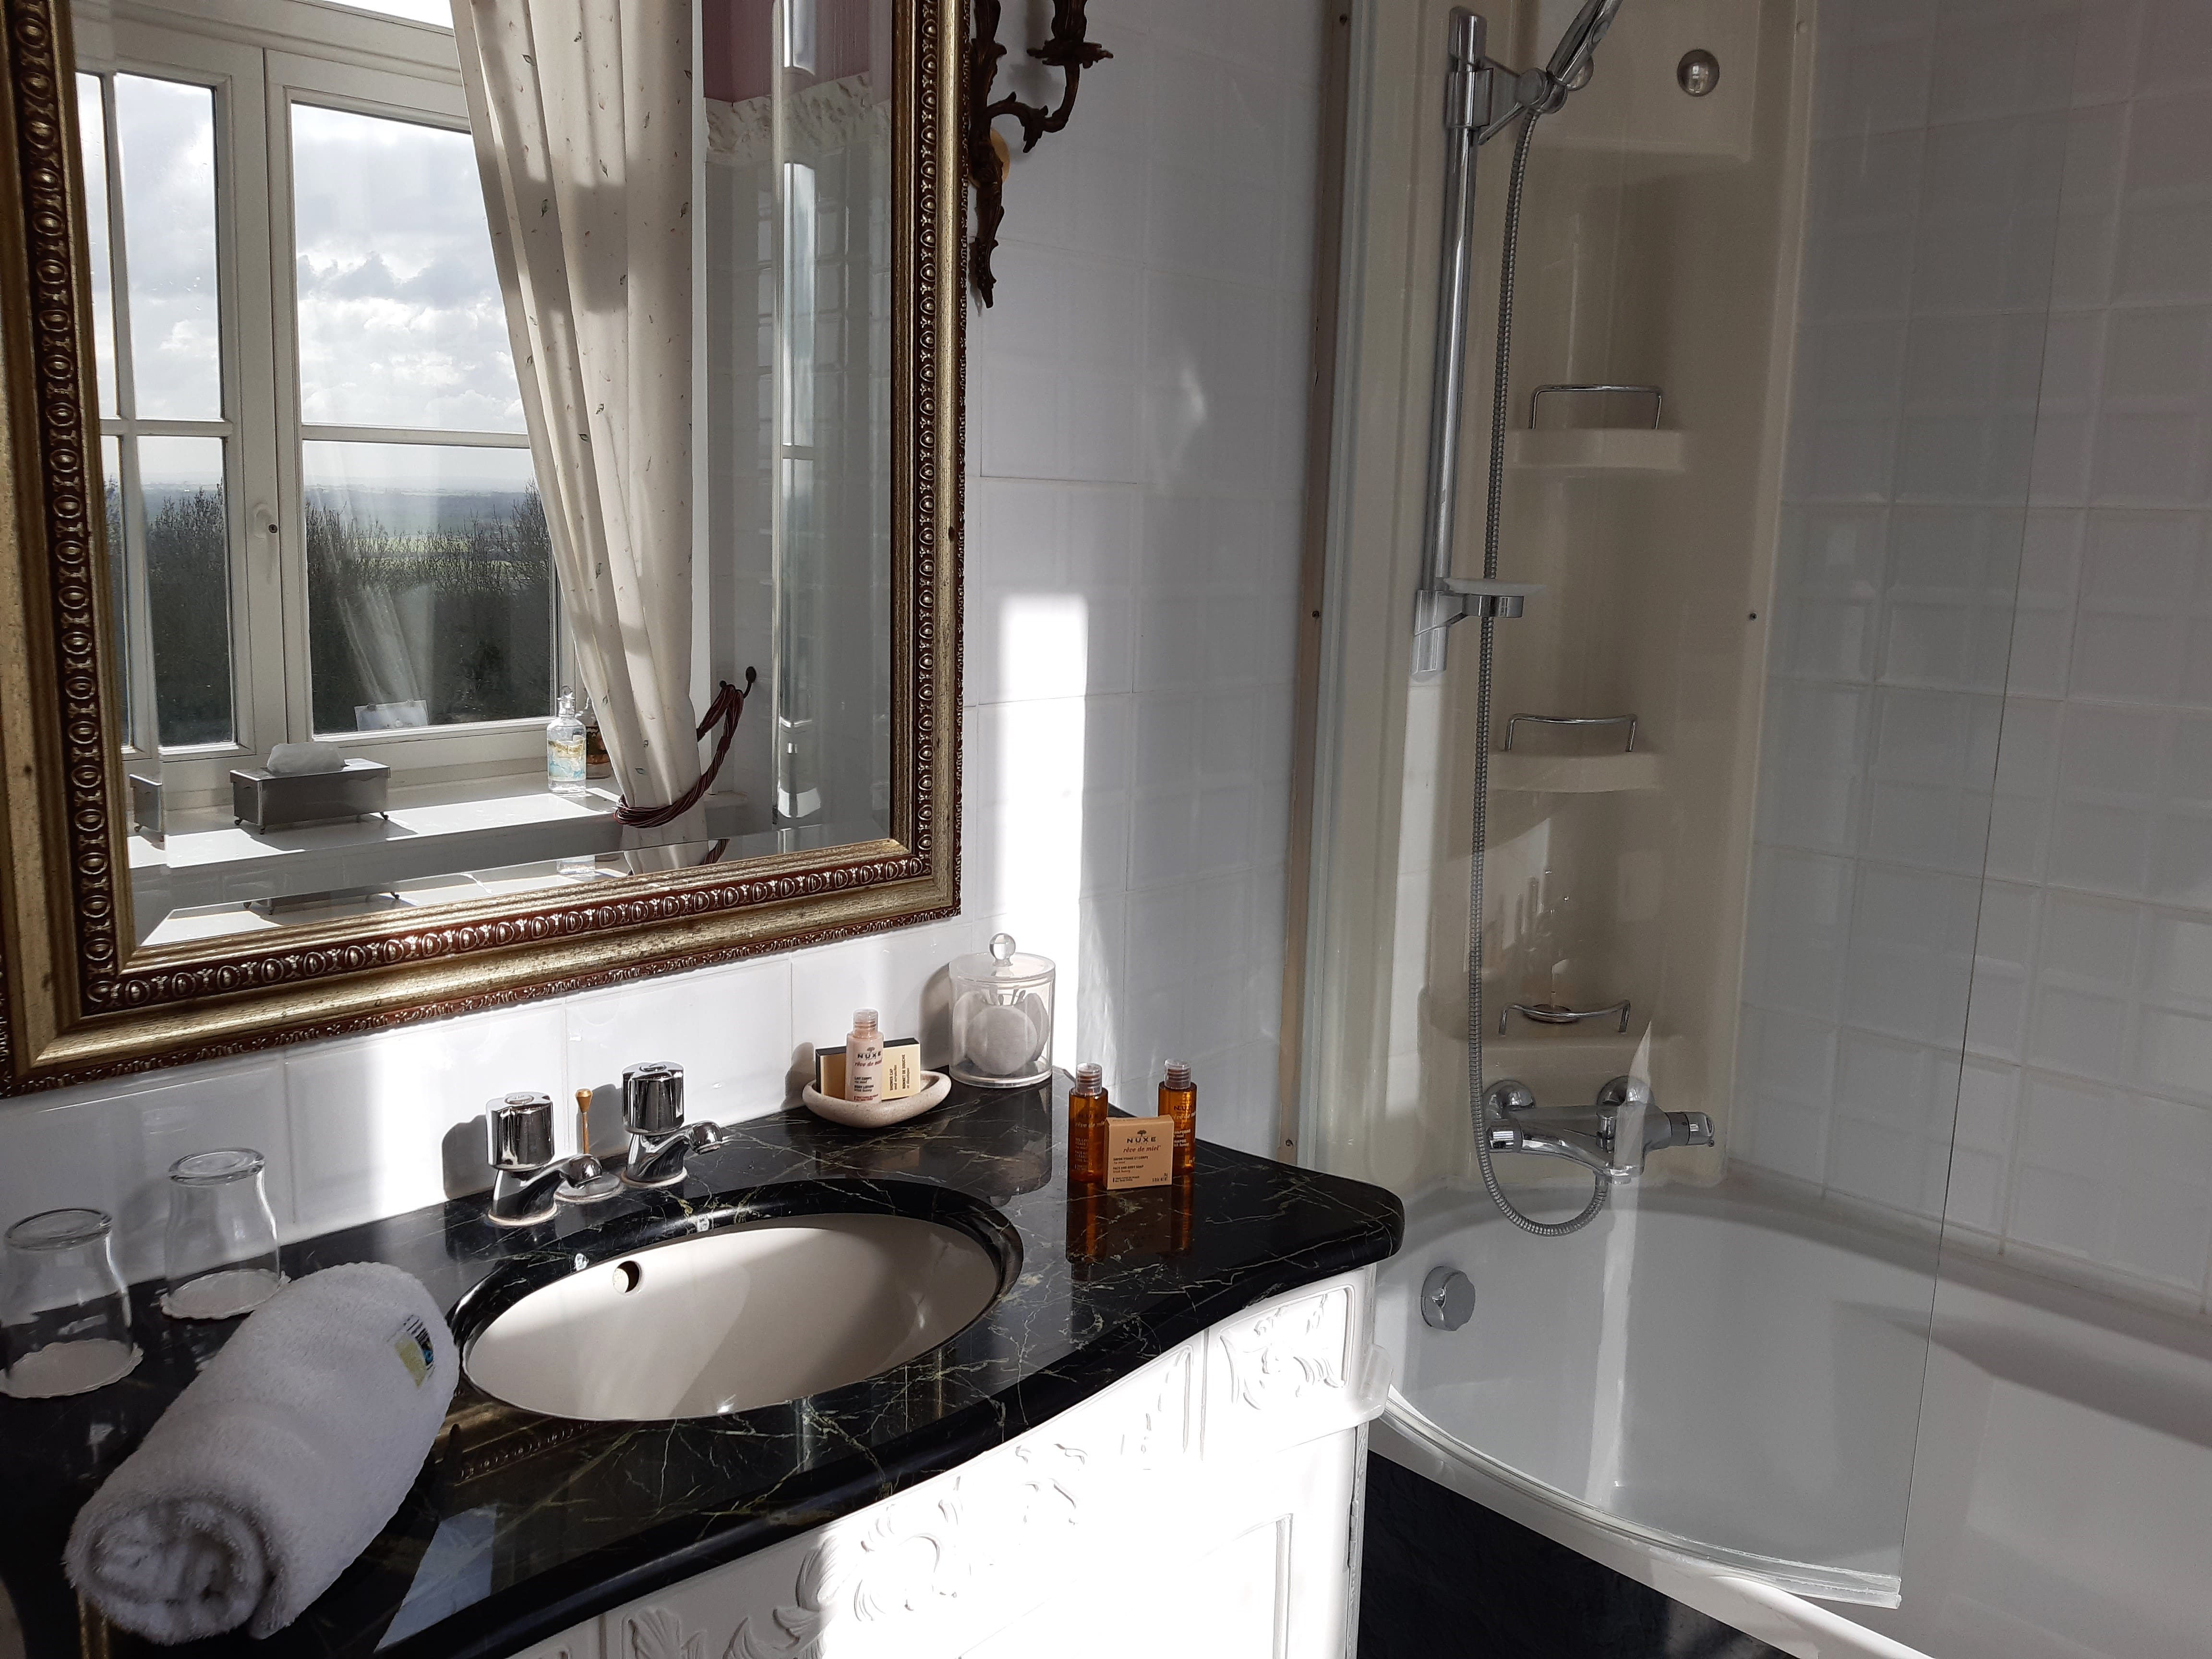 salle de bain-vie en rose-schoebeque-min